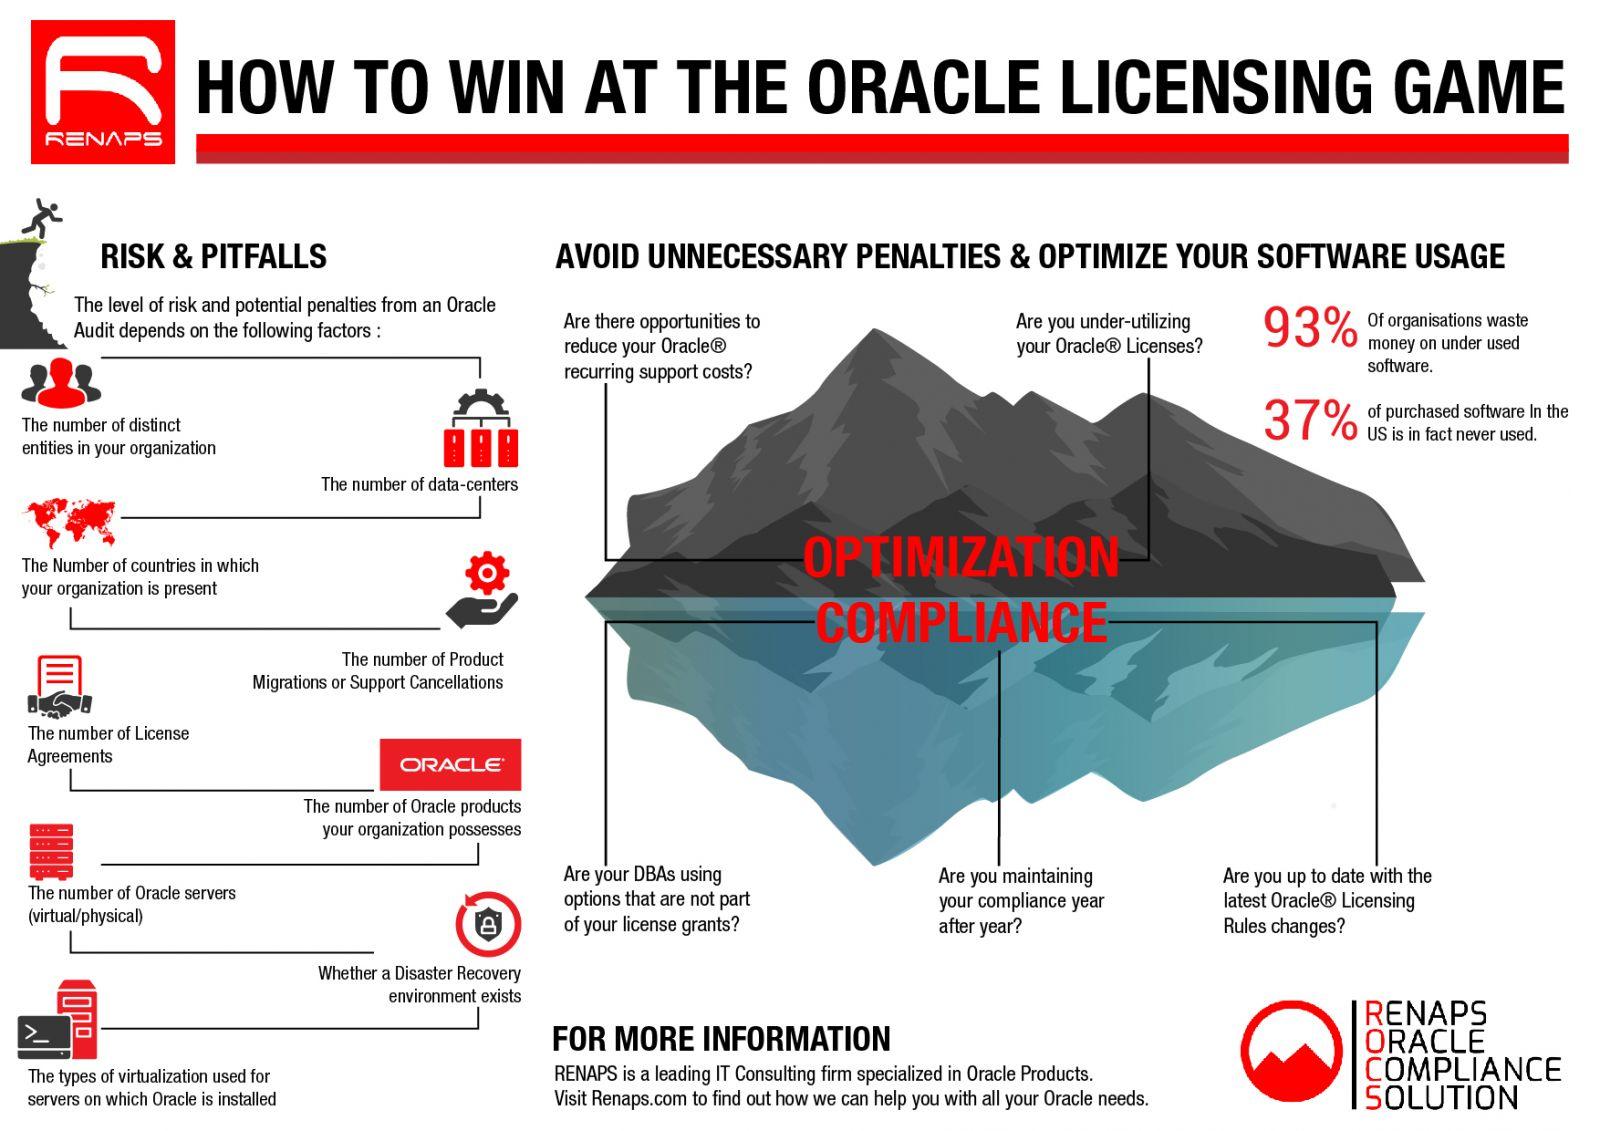 ROCS - RENAPS Oracle Compliance Solution